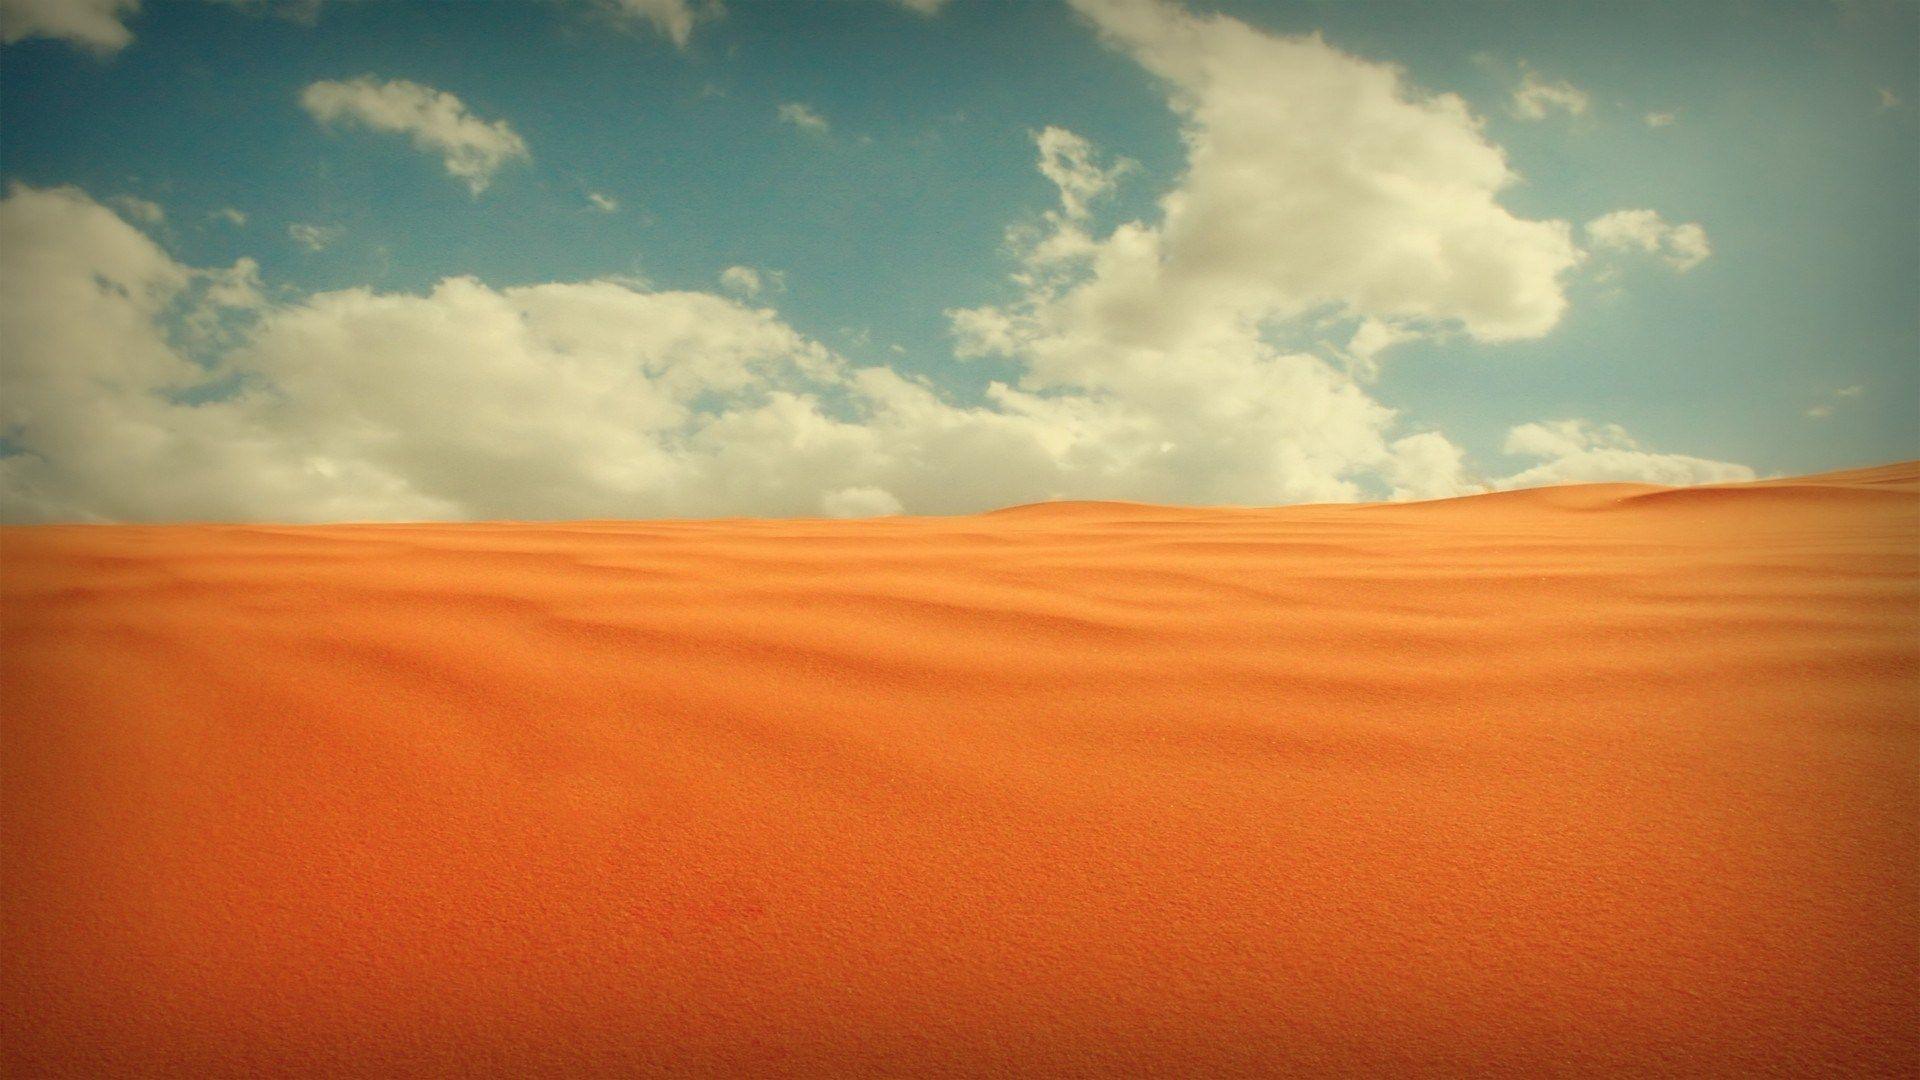 1920x1080 Wallpaper Images Desert Desert Photography Landscape Wallpaper Landscape Pictures